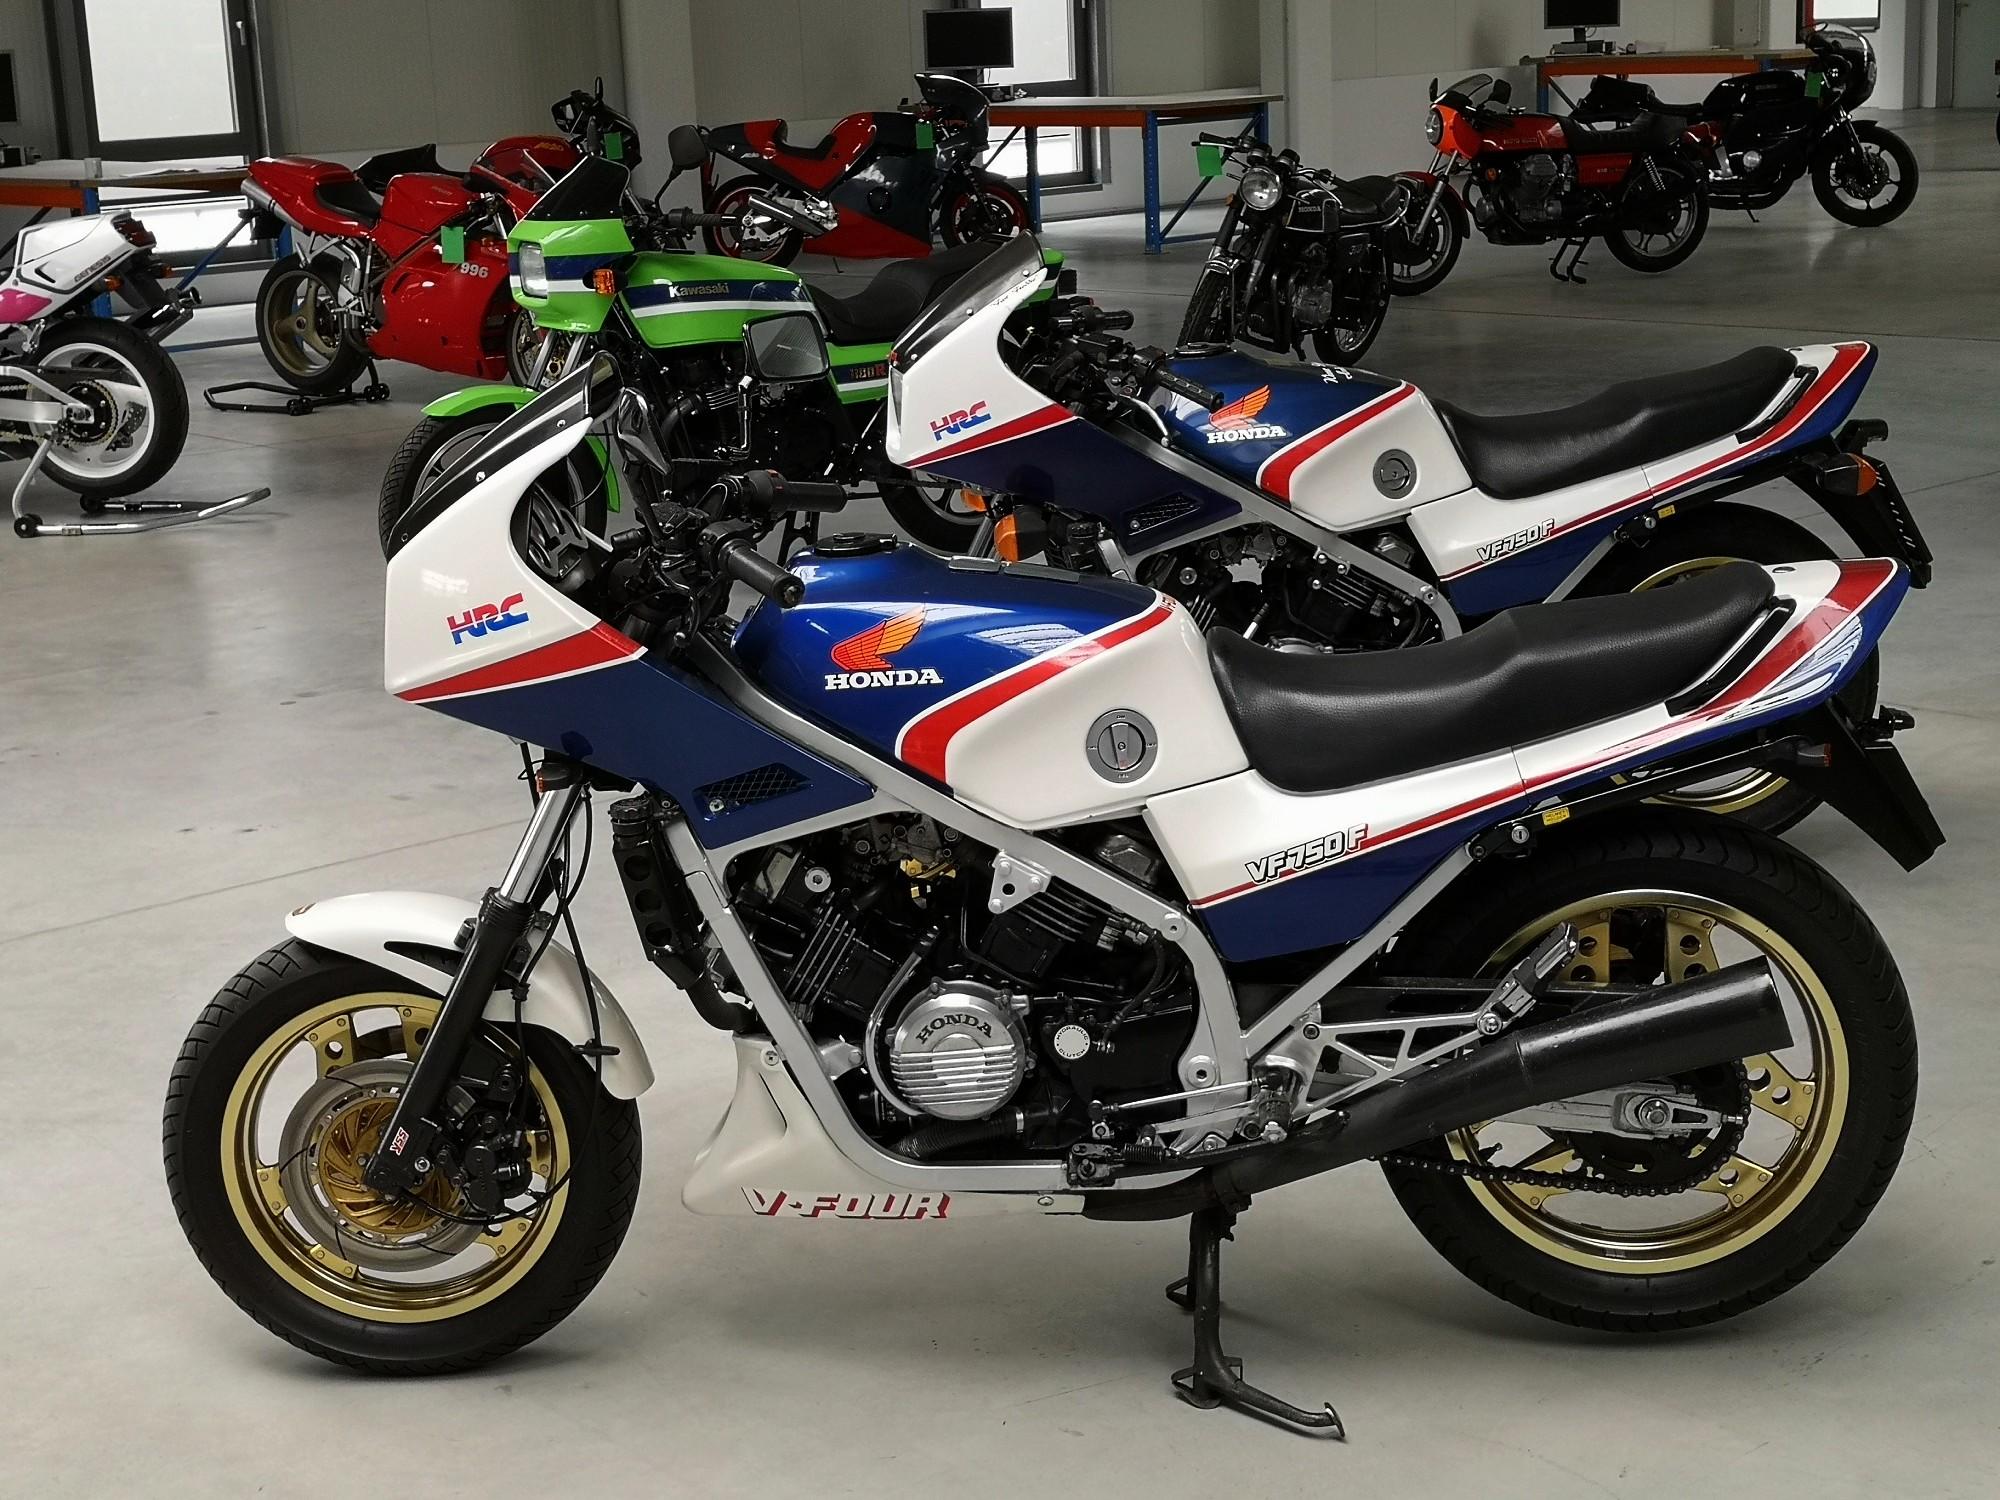 New old motorcycle: HONDA VF 750 F